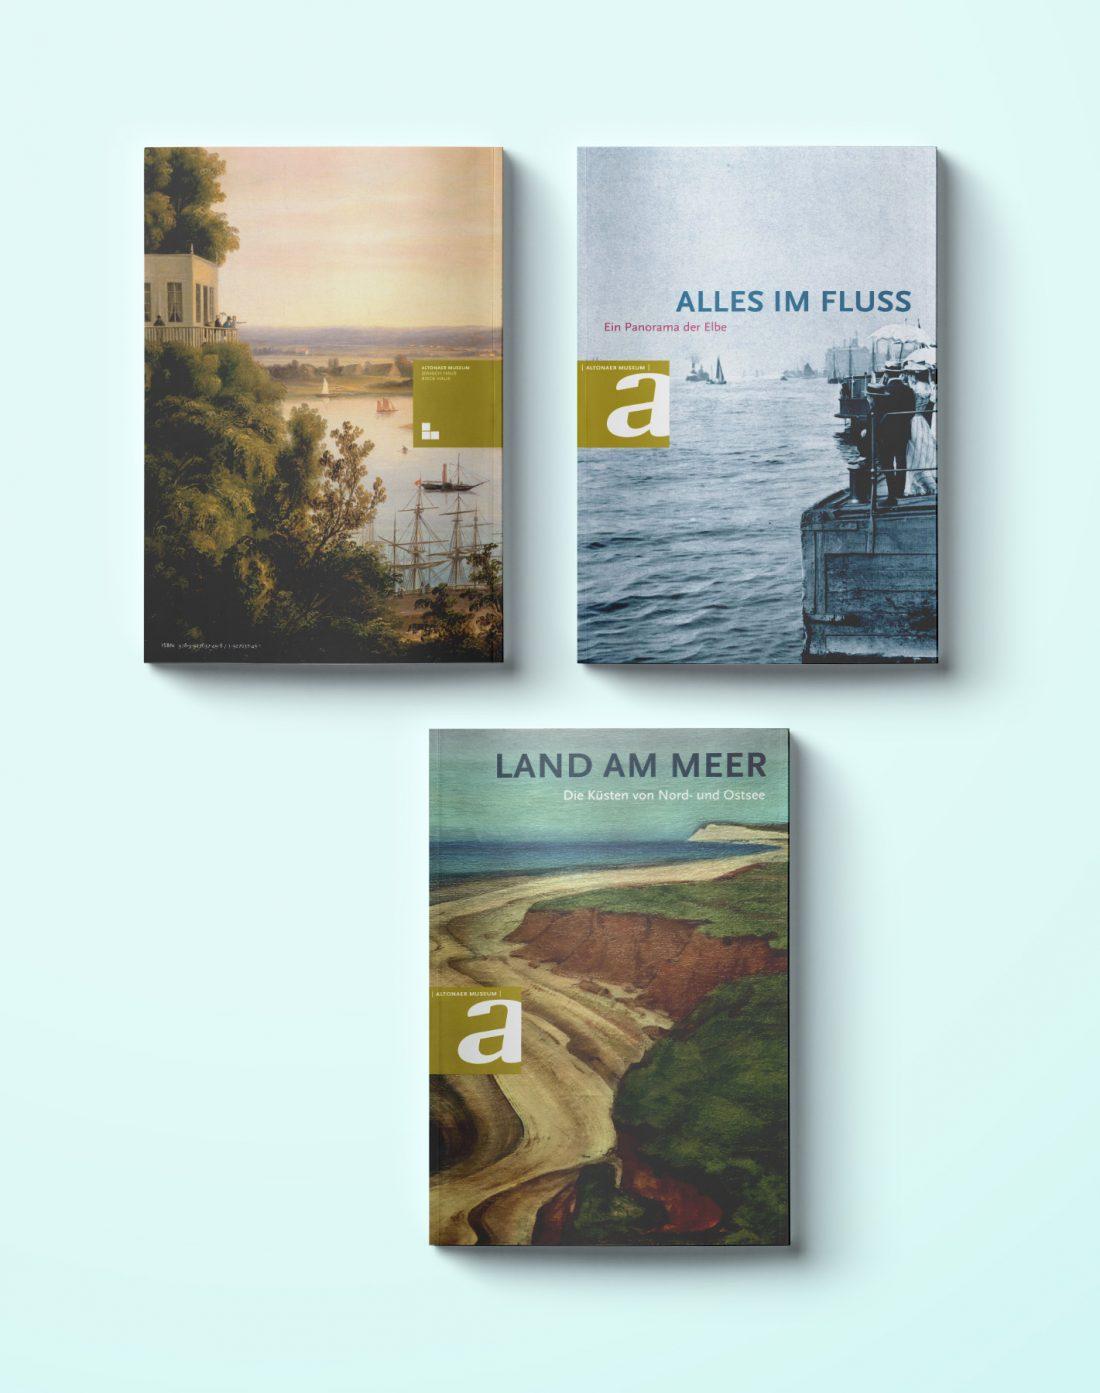 Grafikdesign, Illustration, Buchgestaltung, Covergestaltung, orangerie-grafikdesign, Heike Börner